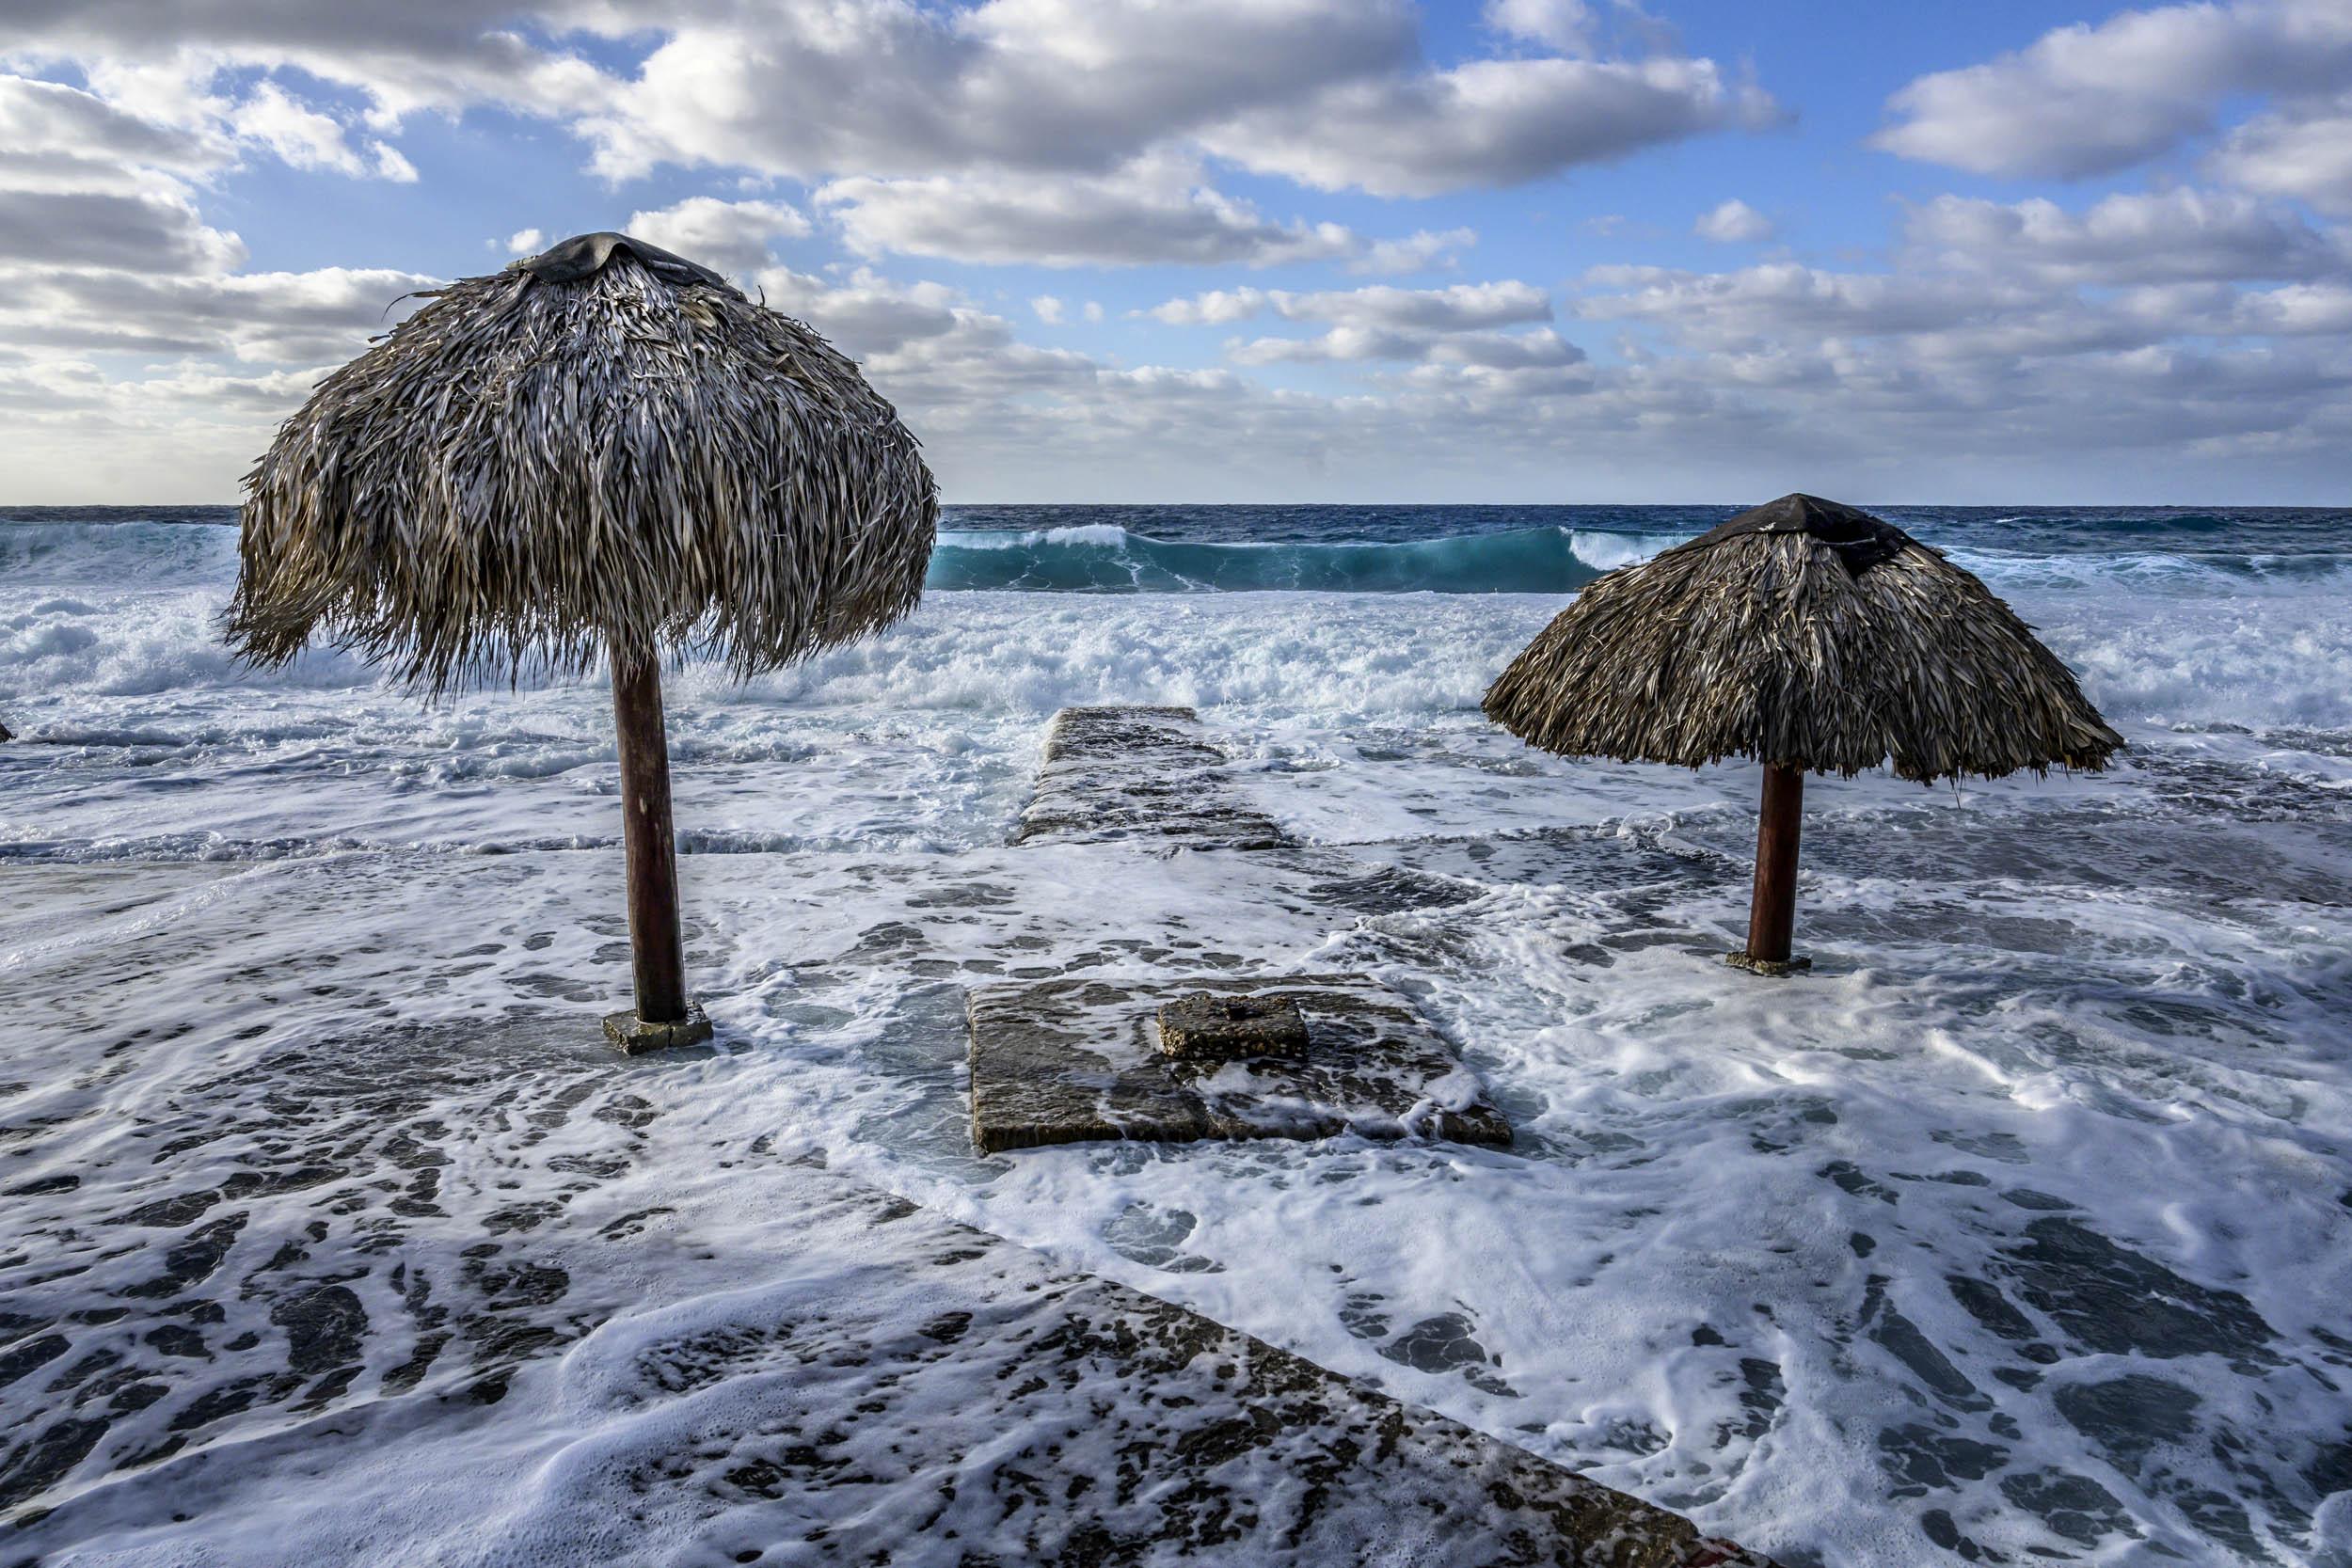 Cuba - Hector Garrido, Aerial and human photography